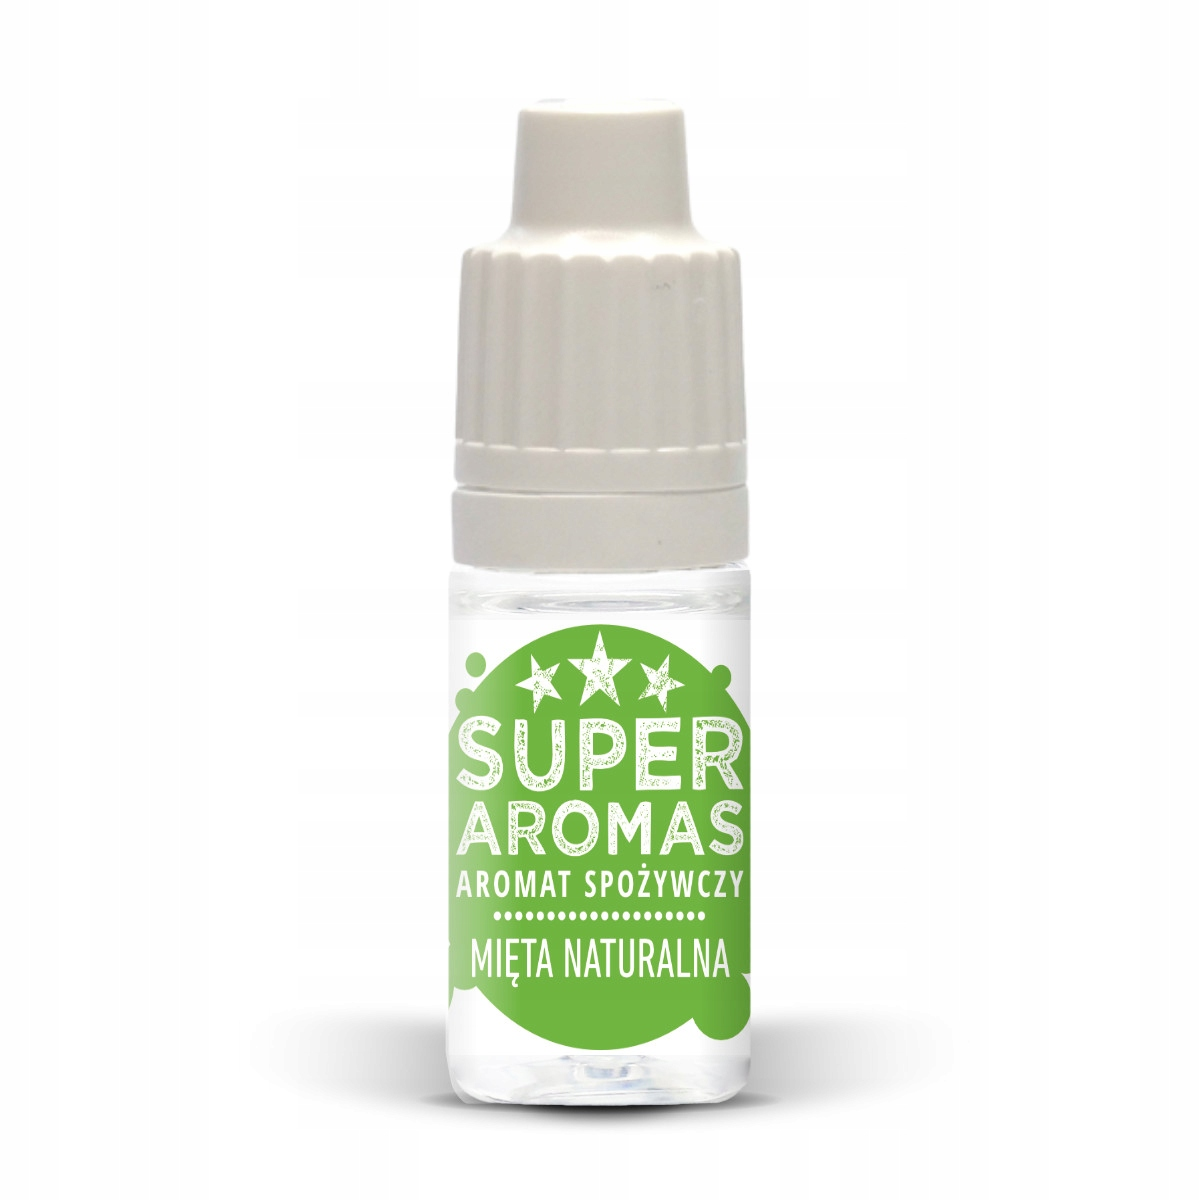 SUPER AROMAS Aromat spożywczy MIĘTA NATURALNA 10ml